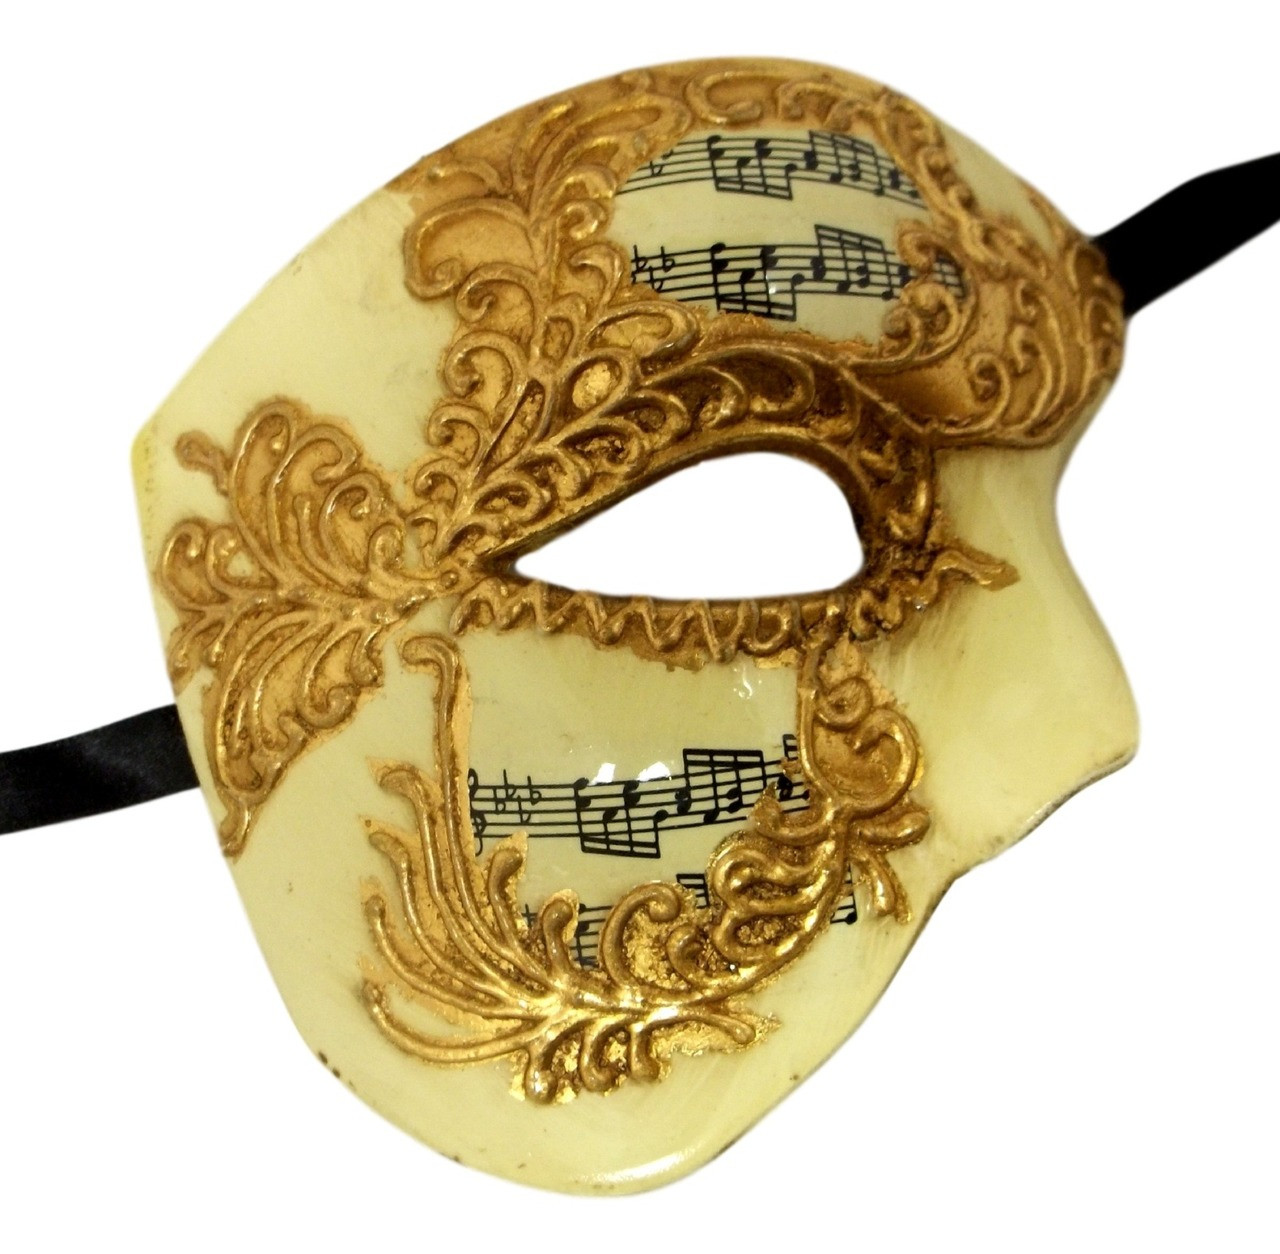 PHANTOM VENETIAN MASQUERADE MARDI GRAS COSTUME HALF MASK MUSICAL NOTE ADULT